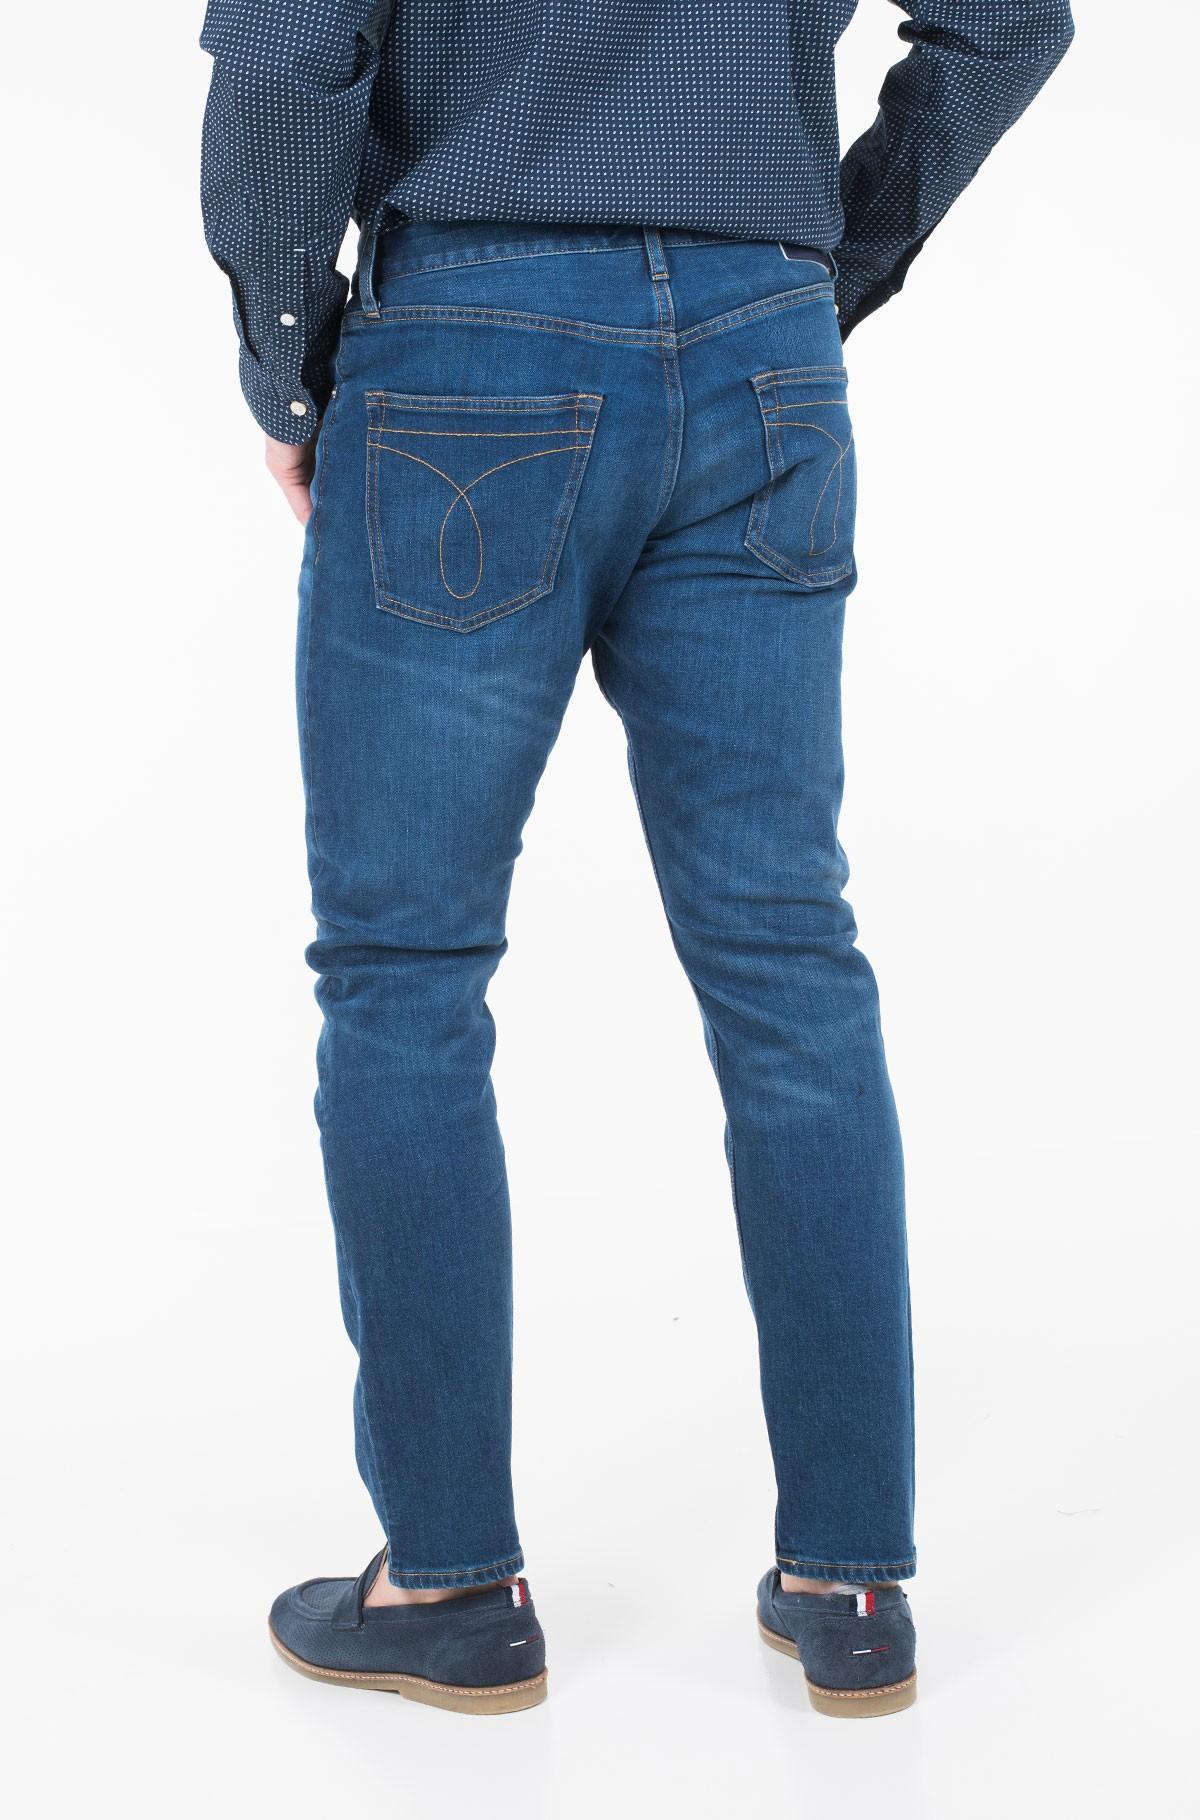 Jeans CKJ 056 ATHLETIC TAPER-full-2